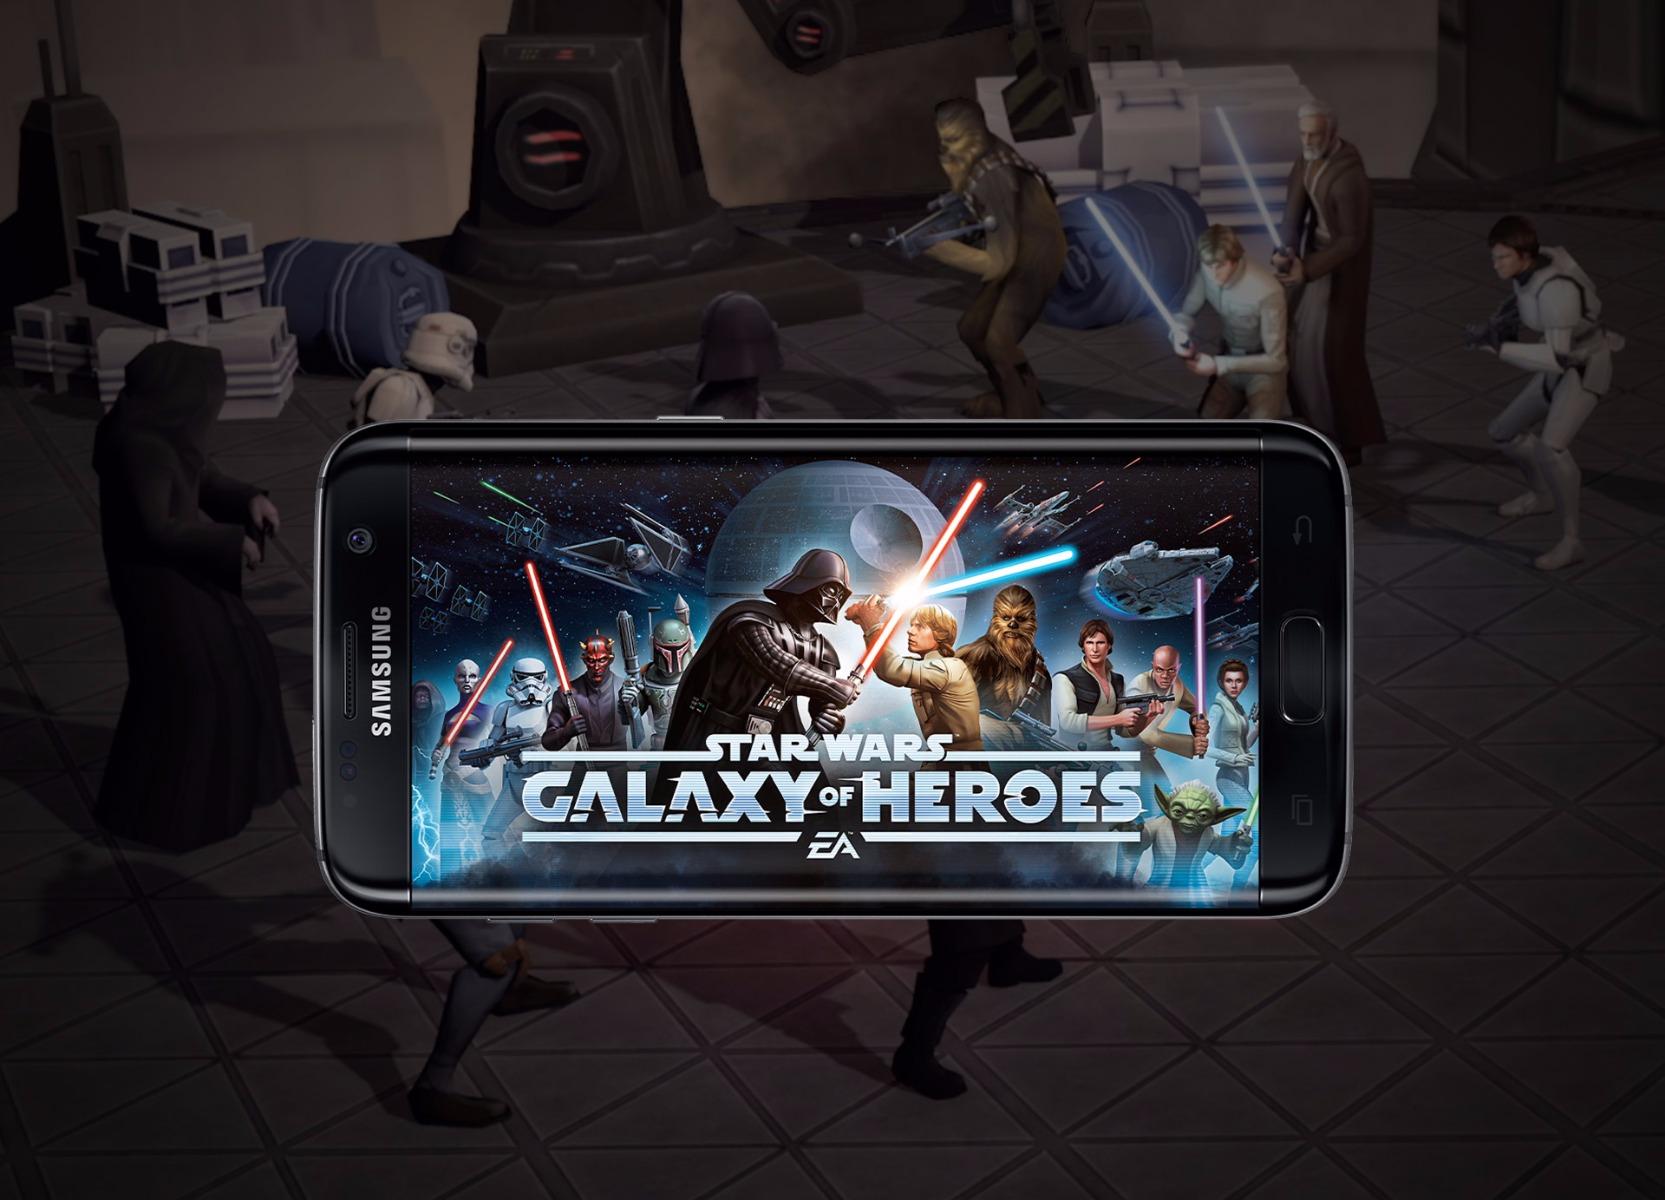 Gsm telefon samsung galaxy s7